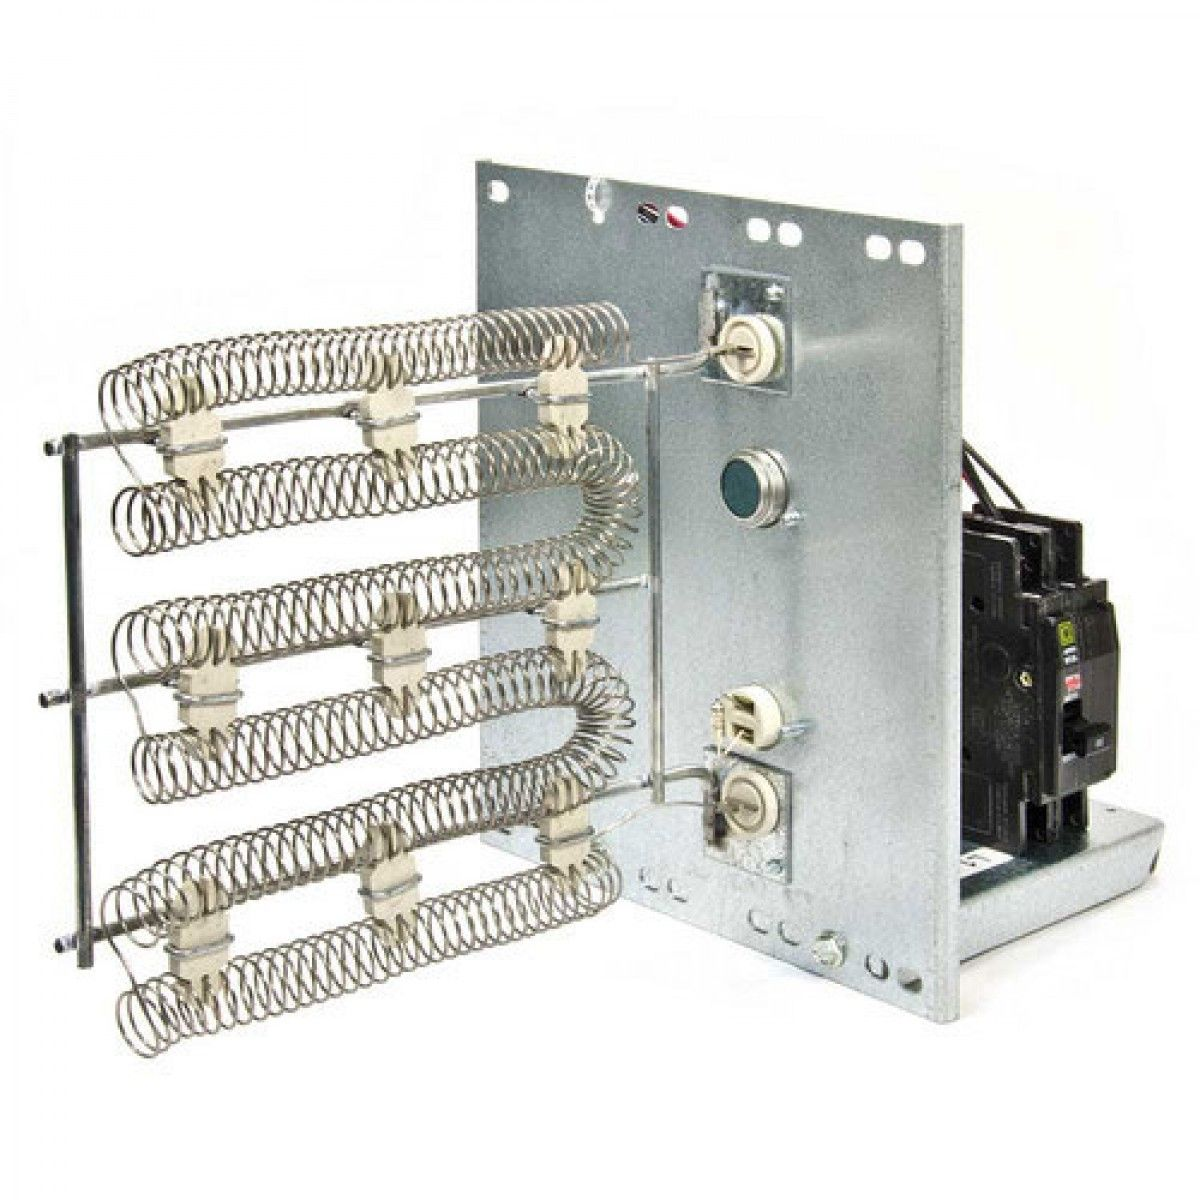 15KW Goodman HKSC15XC Electric Heat Kit w/Breaker for Air Handlers